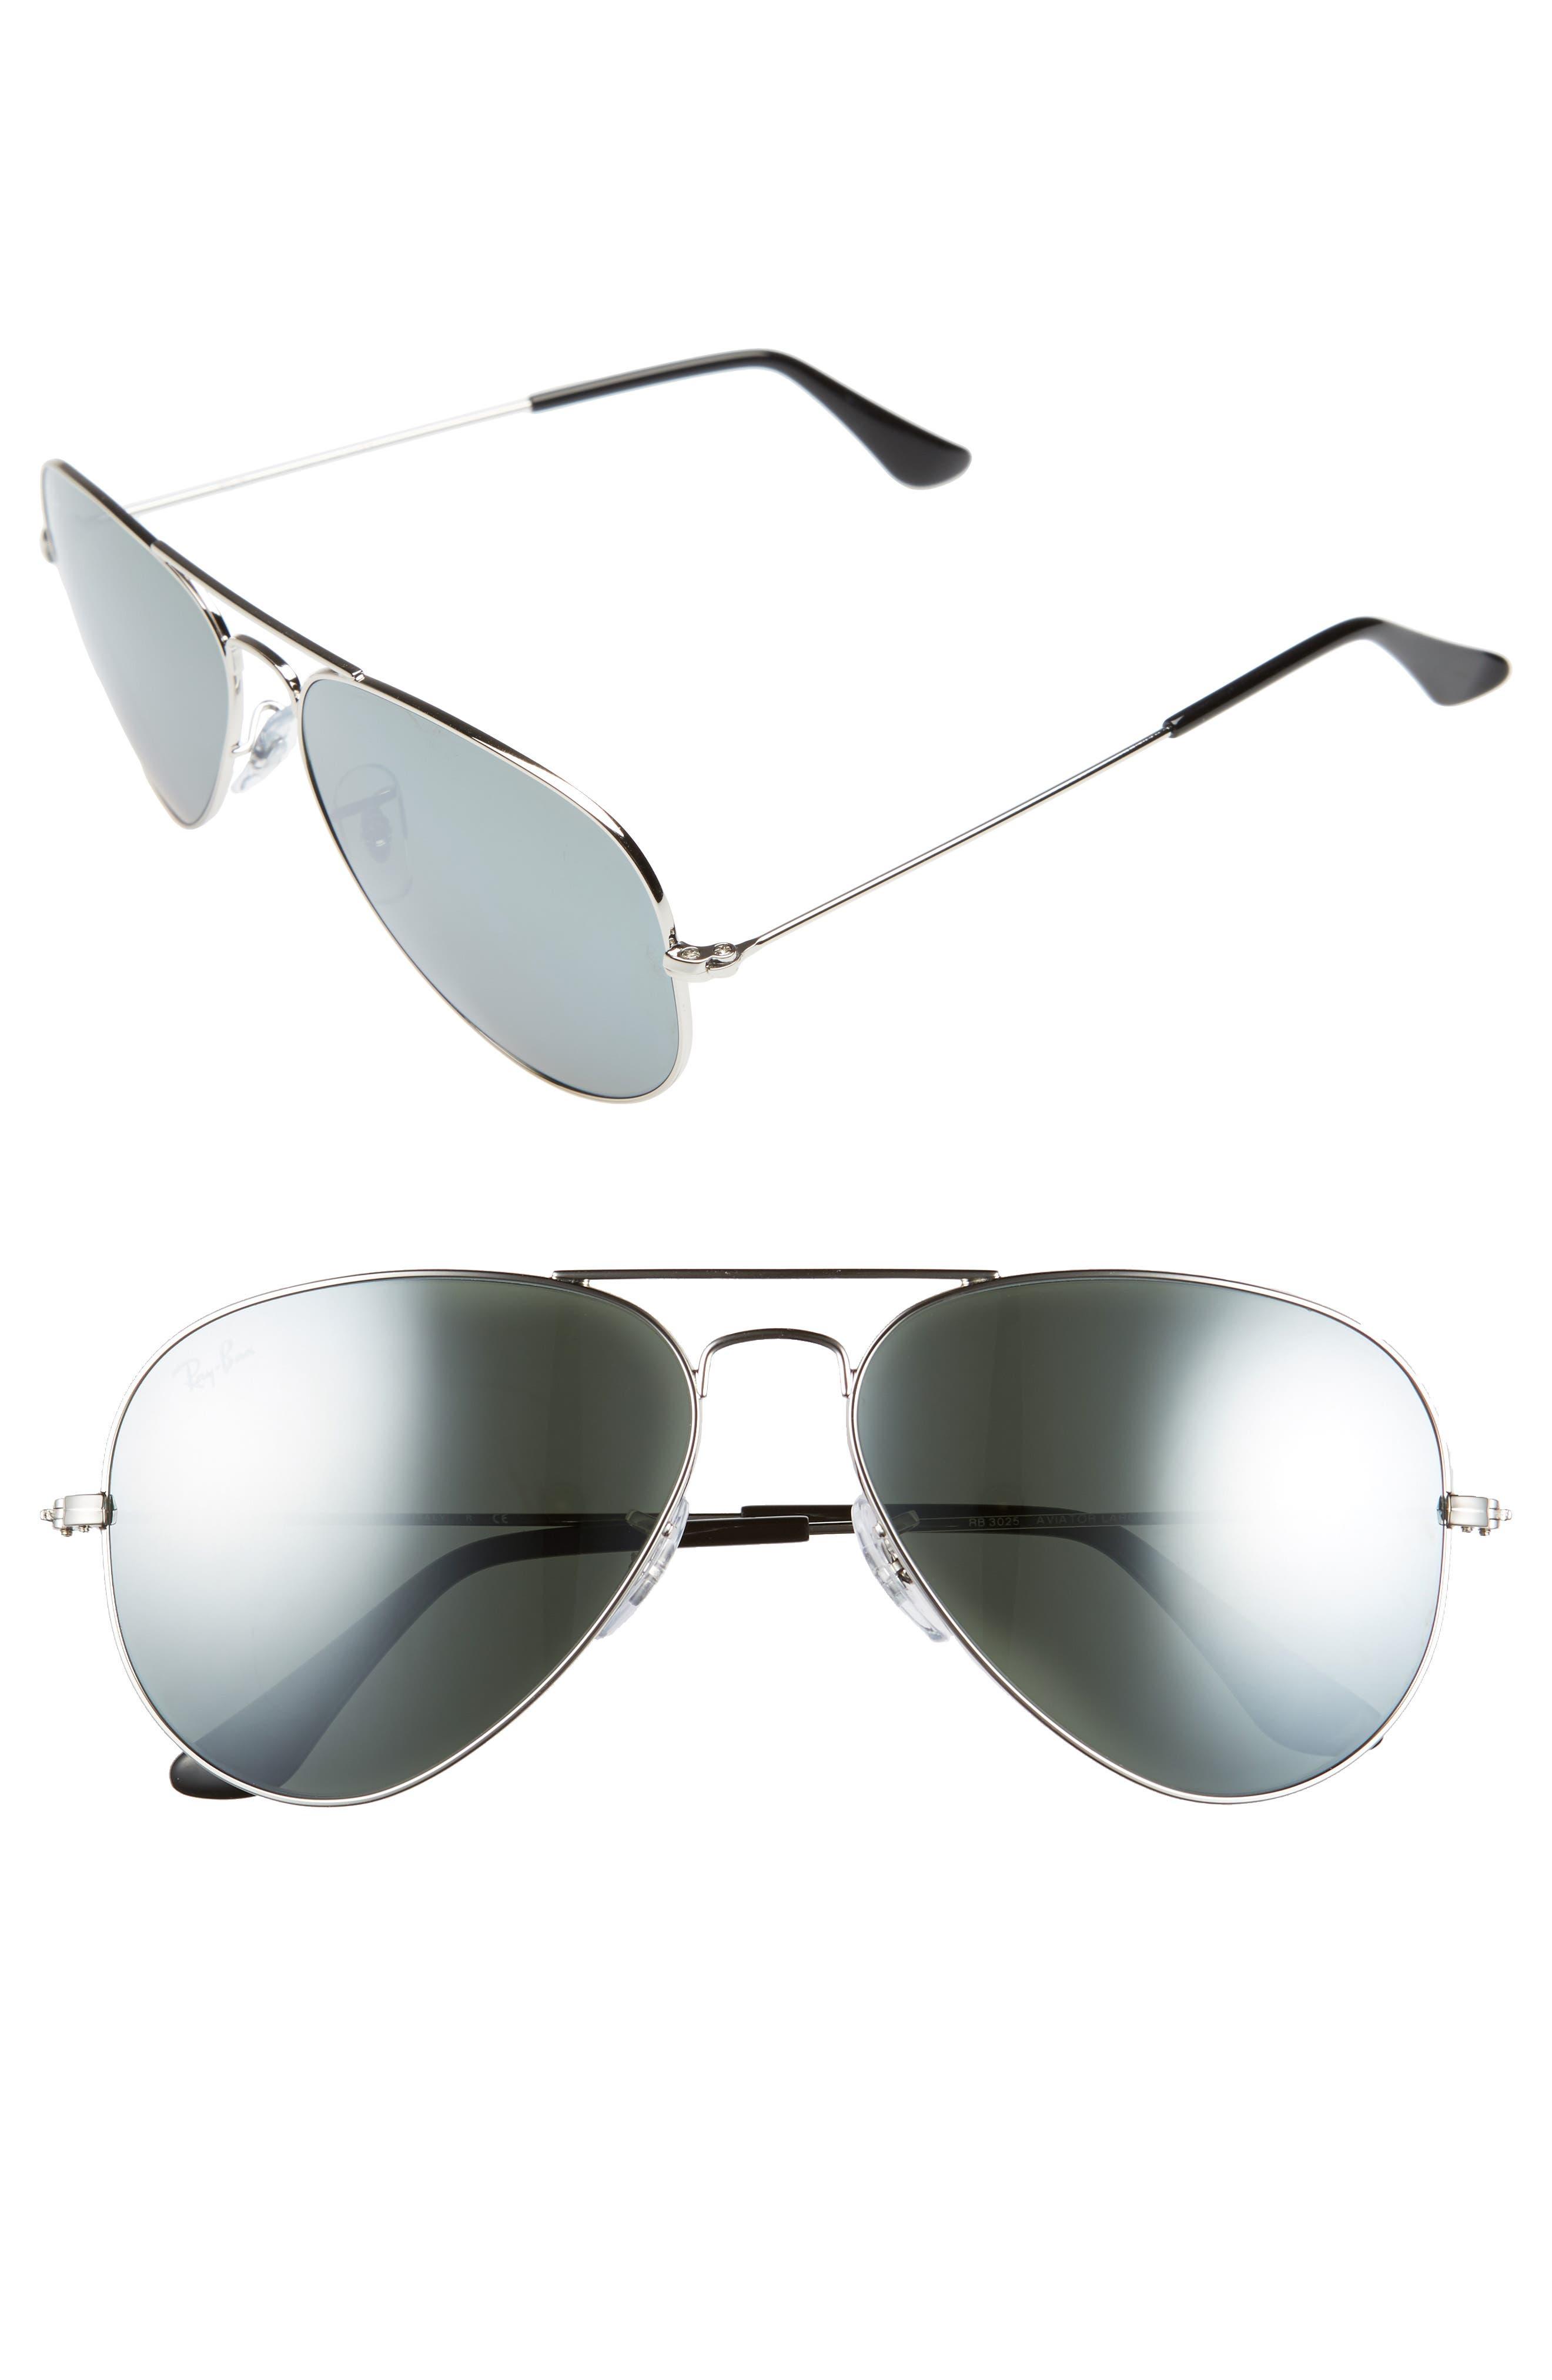 Original Aviator 58mm Sunglasses,                             Alternate thumbnail 2, color,                             SILVER/ GREY MIRROR